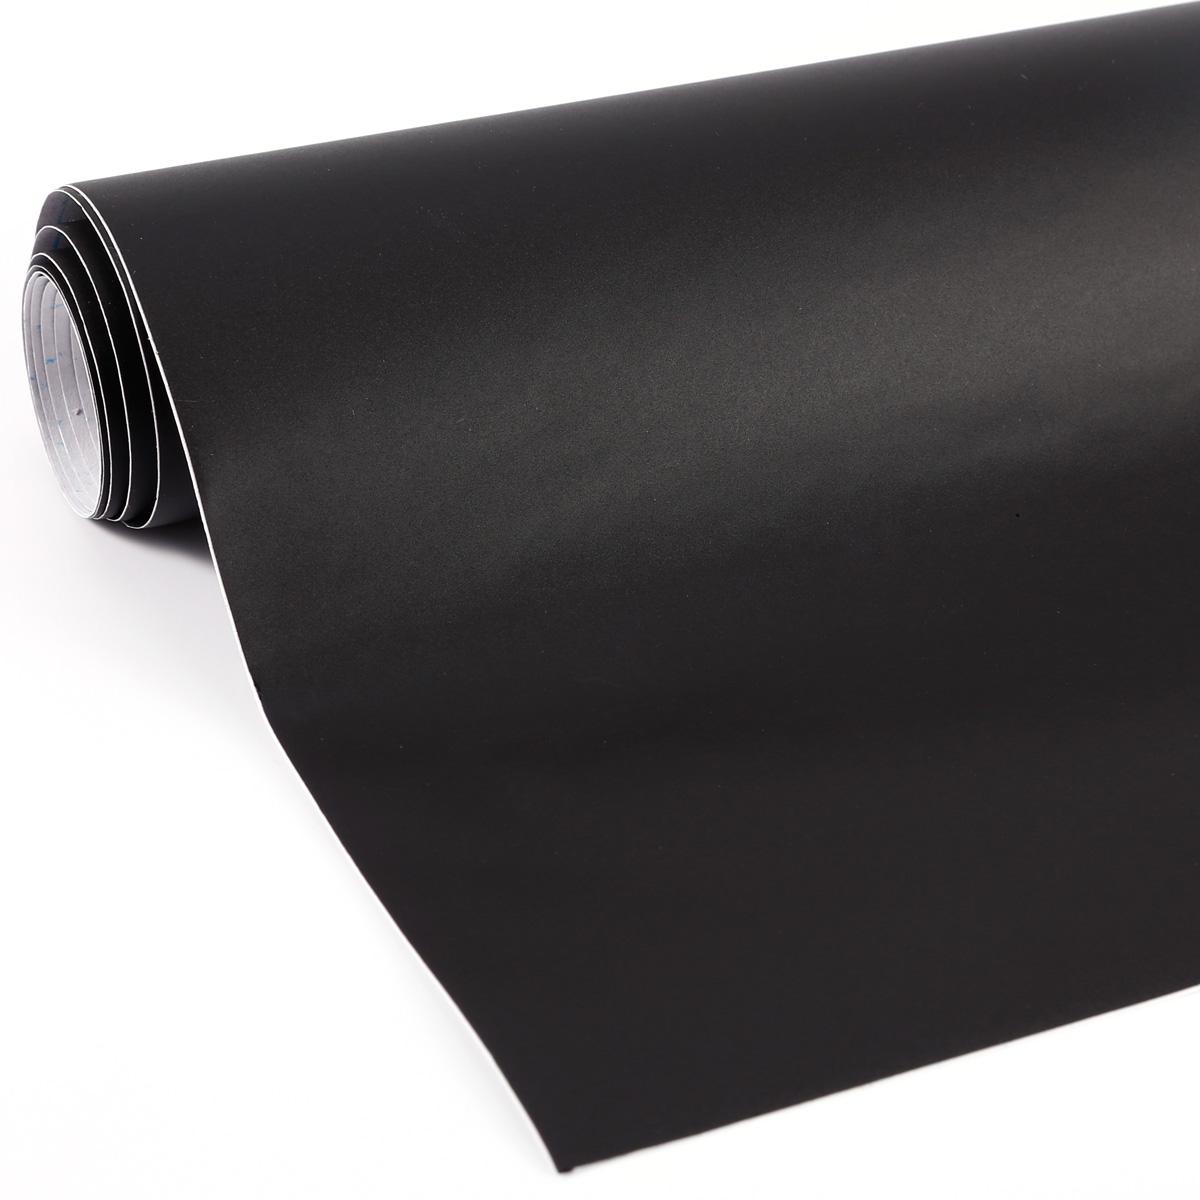 selbstklebende tafelfolie kreidefolie zum beschreiben inkl. Black Bedroom Furniture Sets. Home Design Ideas